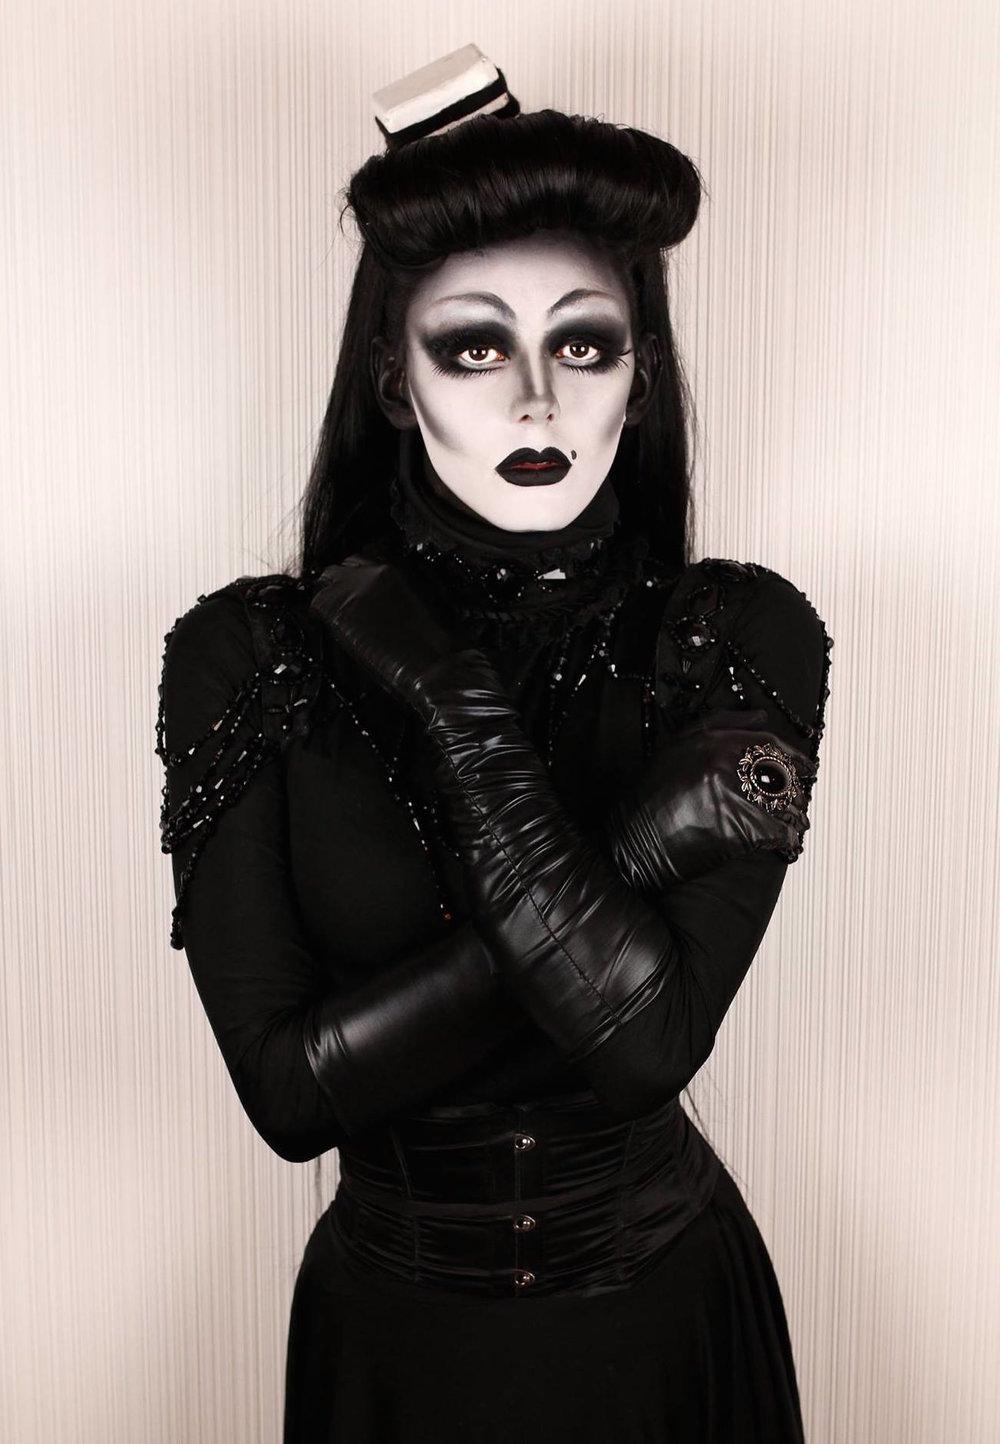 Gothika 4 - Liquorice Black by Jose Hernandez.jpg